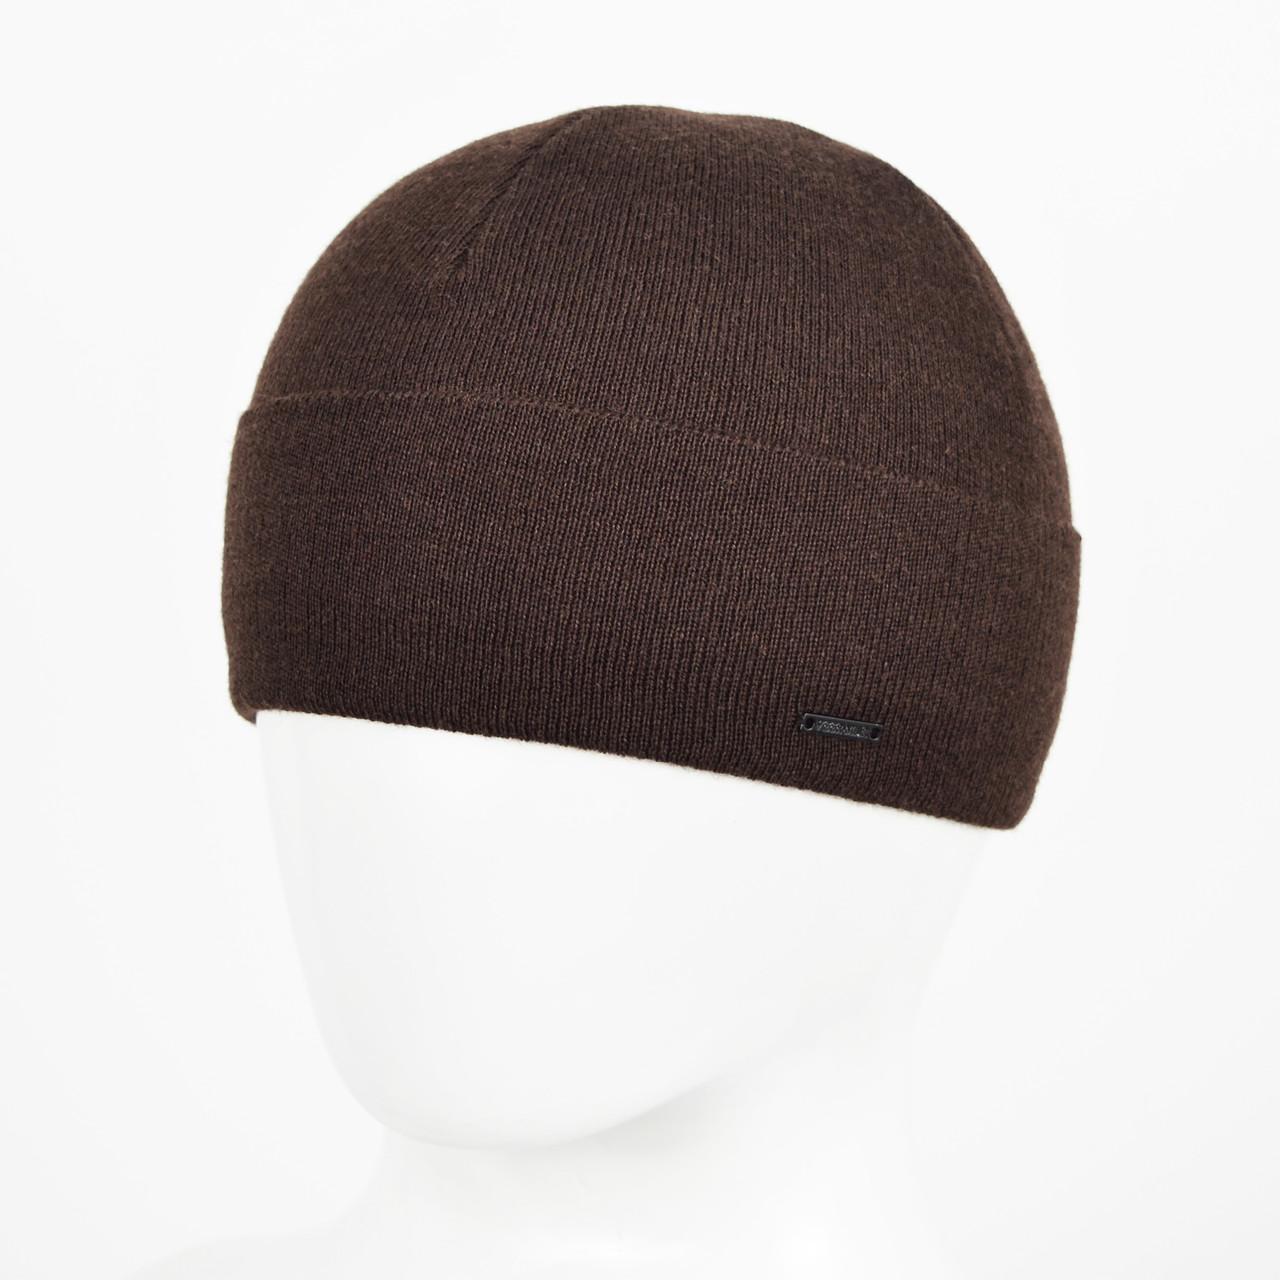 Мужская Шерстяная шапка Veer-Mar. № 468 Коричневый